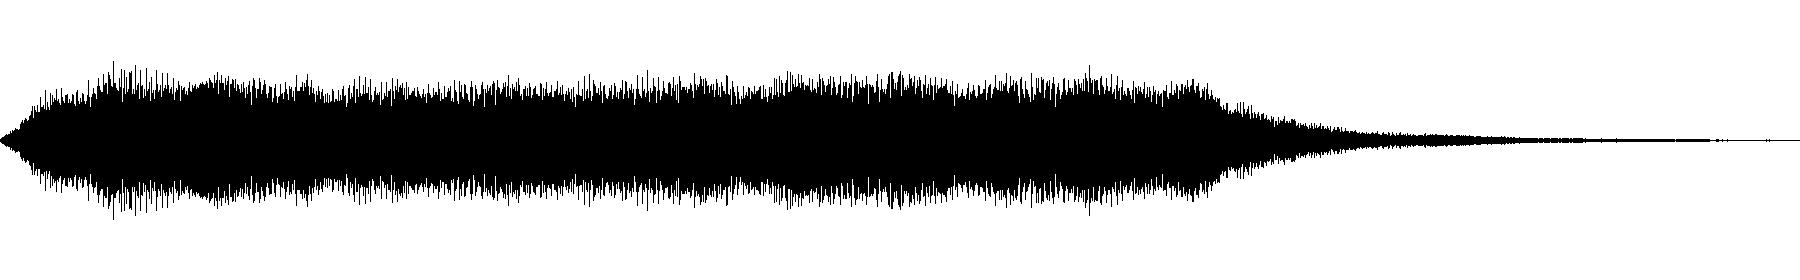 organ fsus4